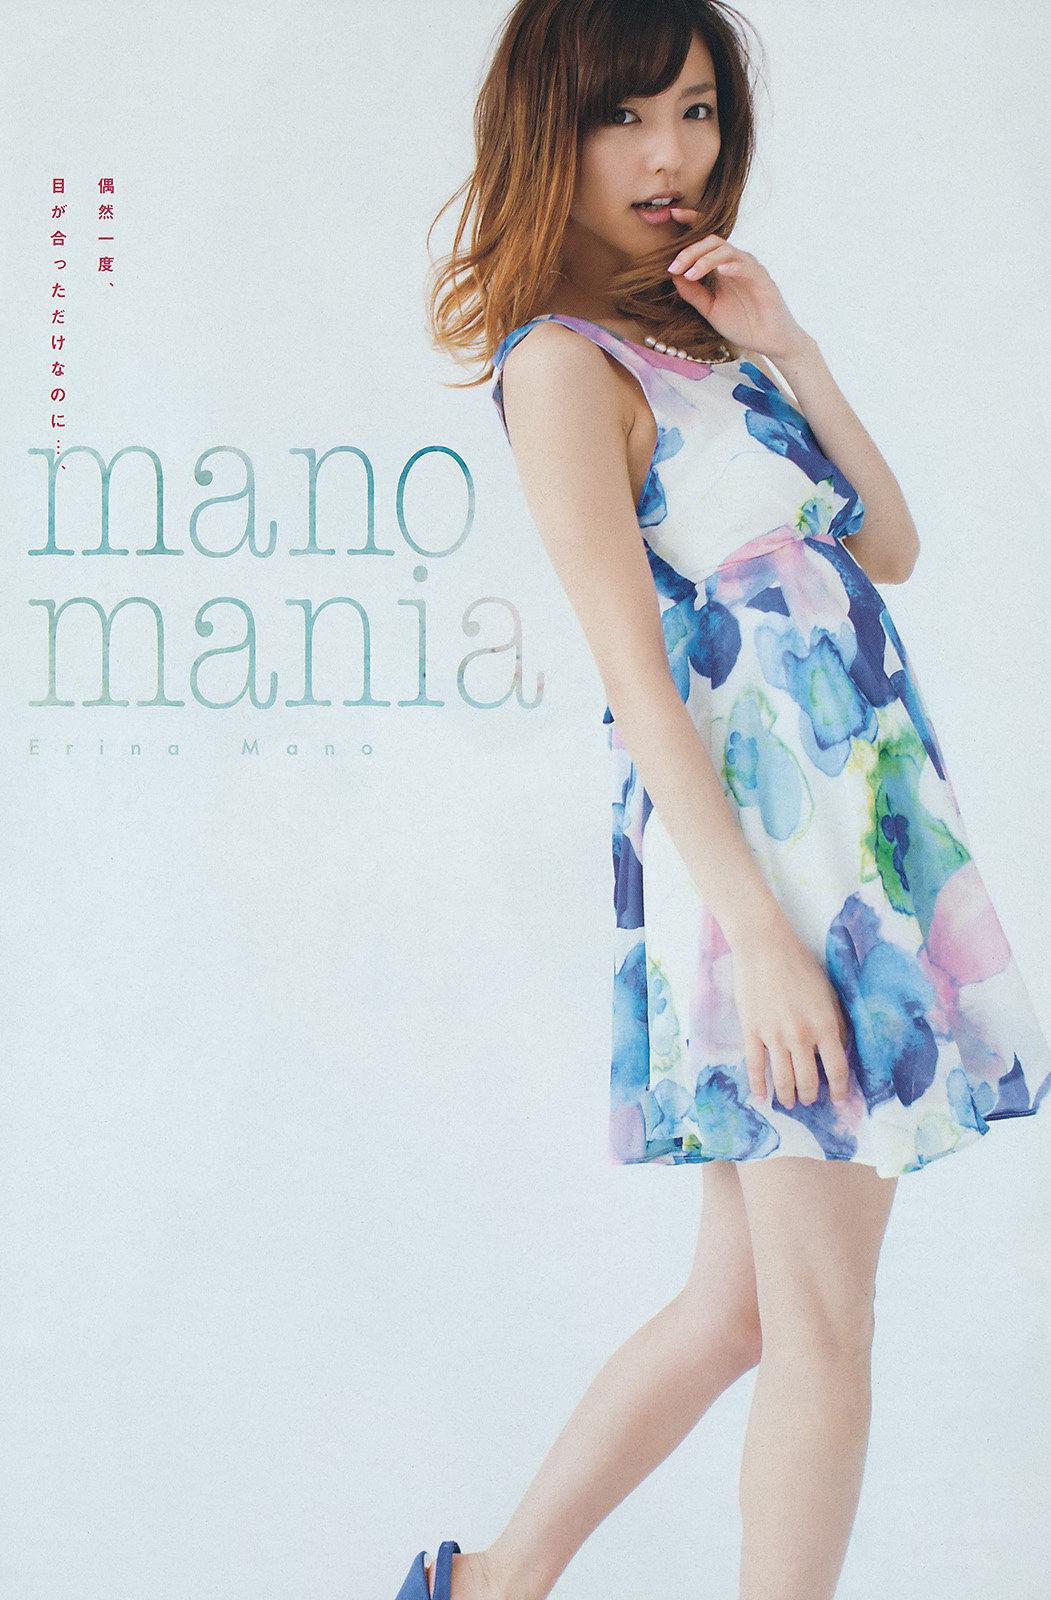 Magazine, Mano Erina, Young Magazine